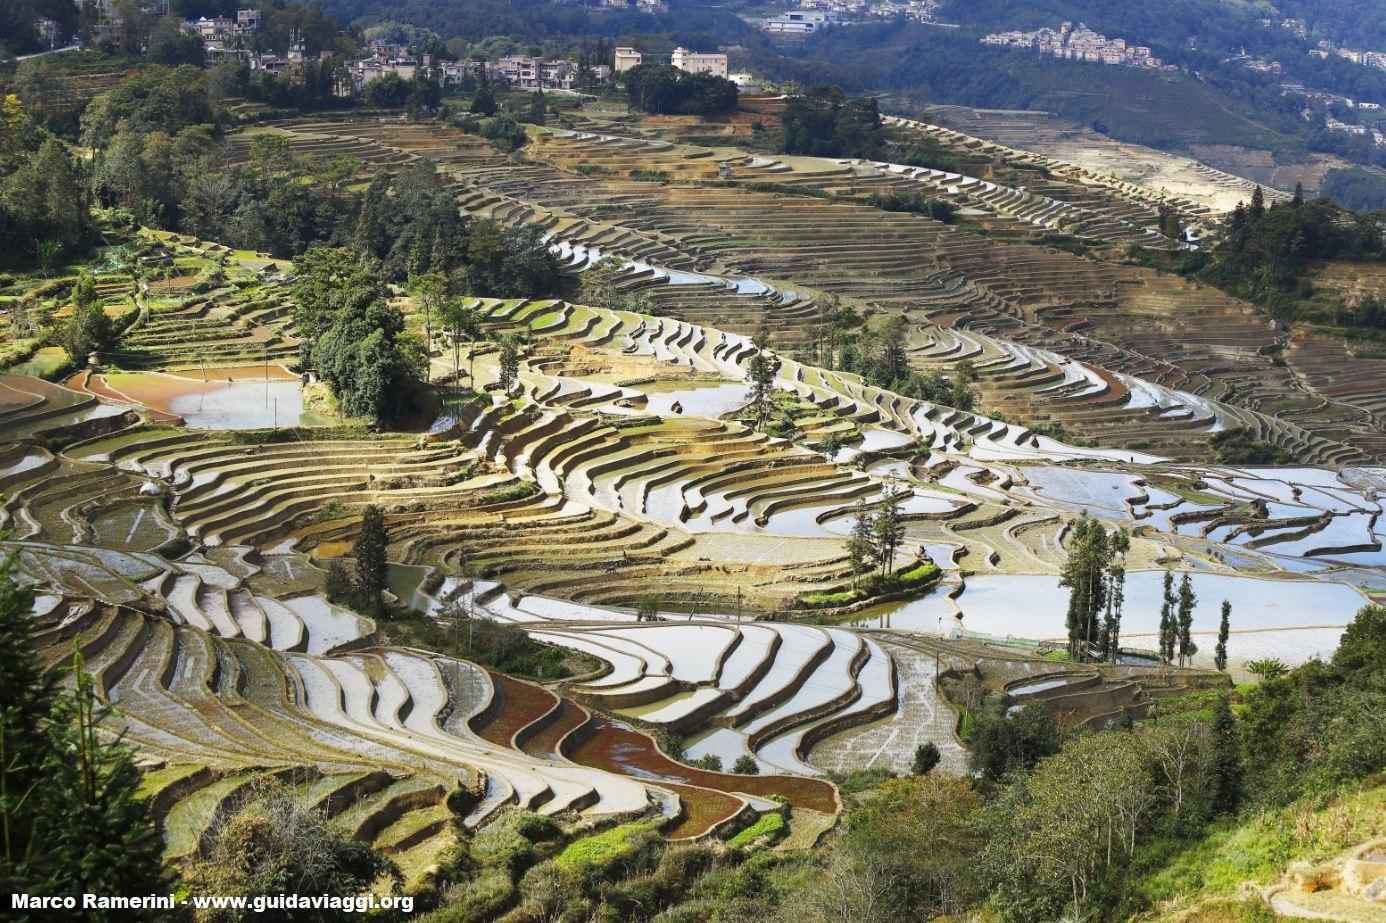 Risaie, Yuanyang, Yunnan, Cina. Autore e Copyright Marco Ramerini